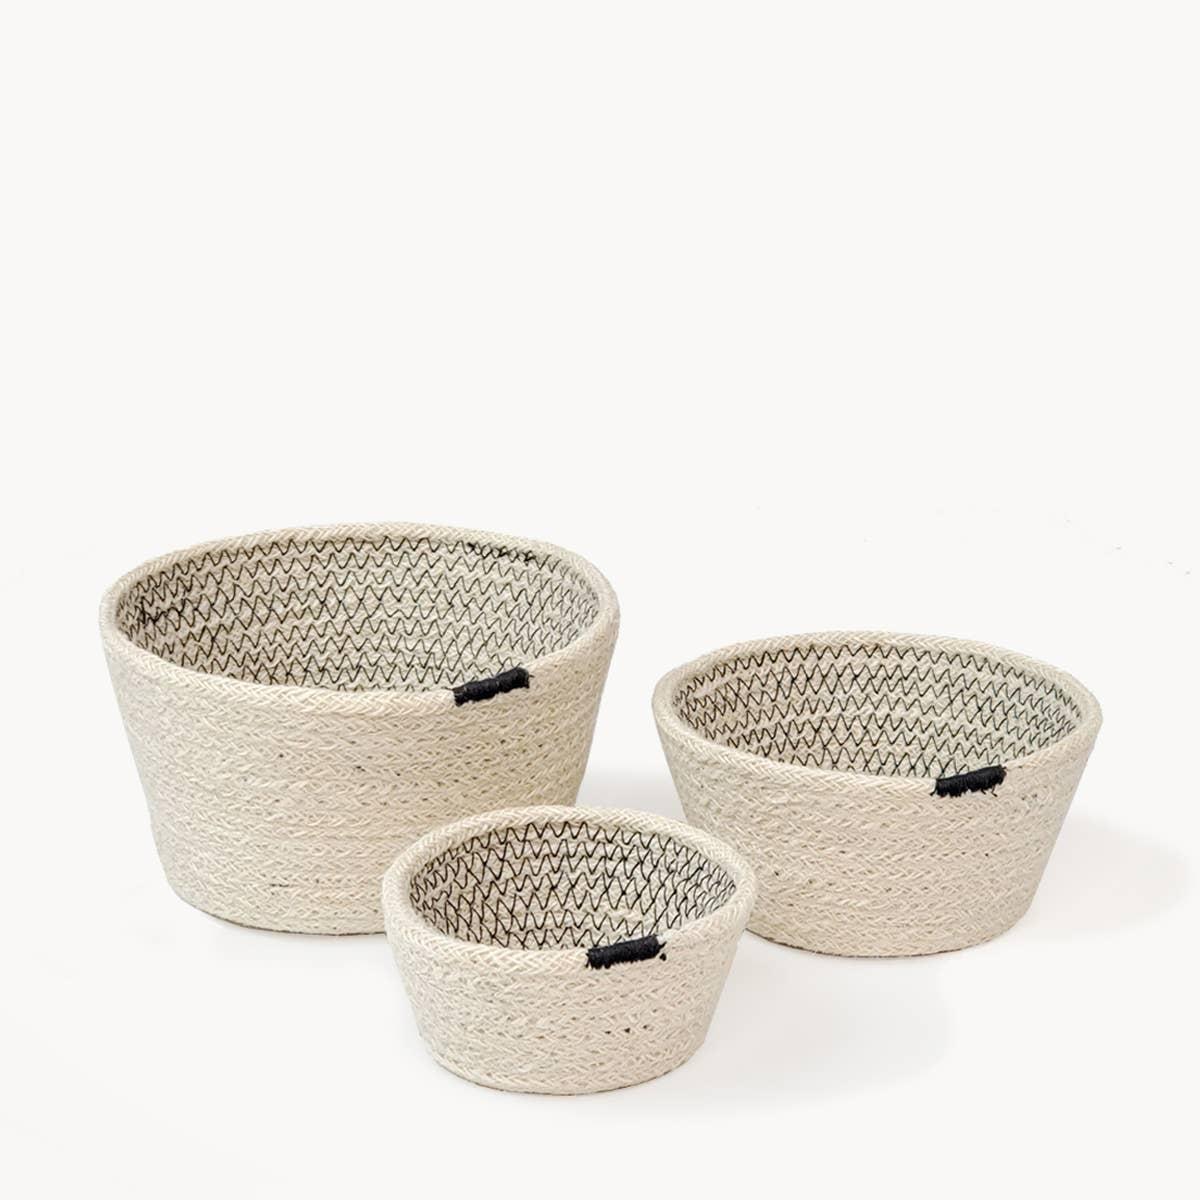 Amari Bowl - Black (Set of 3) | Trada Marketplace